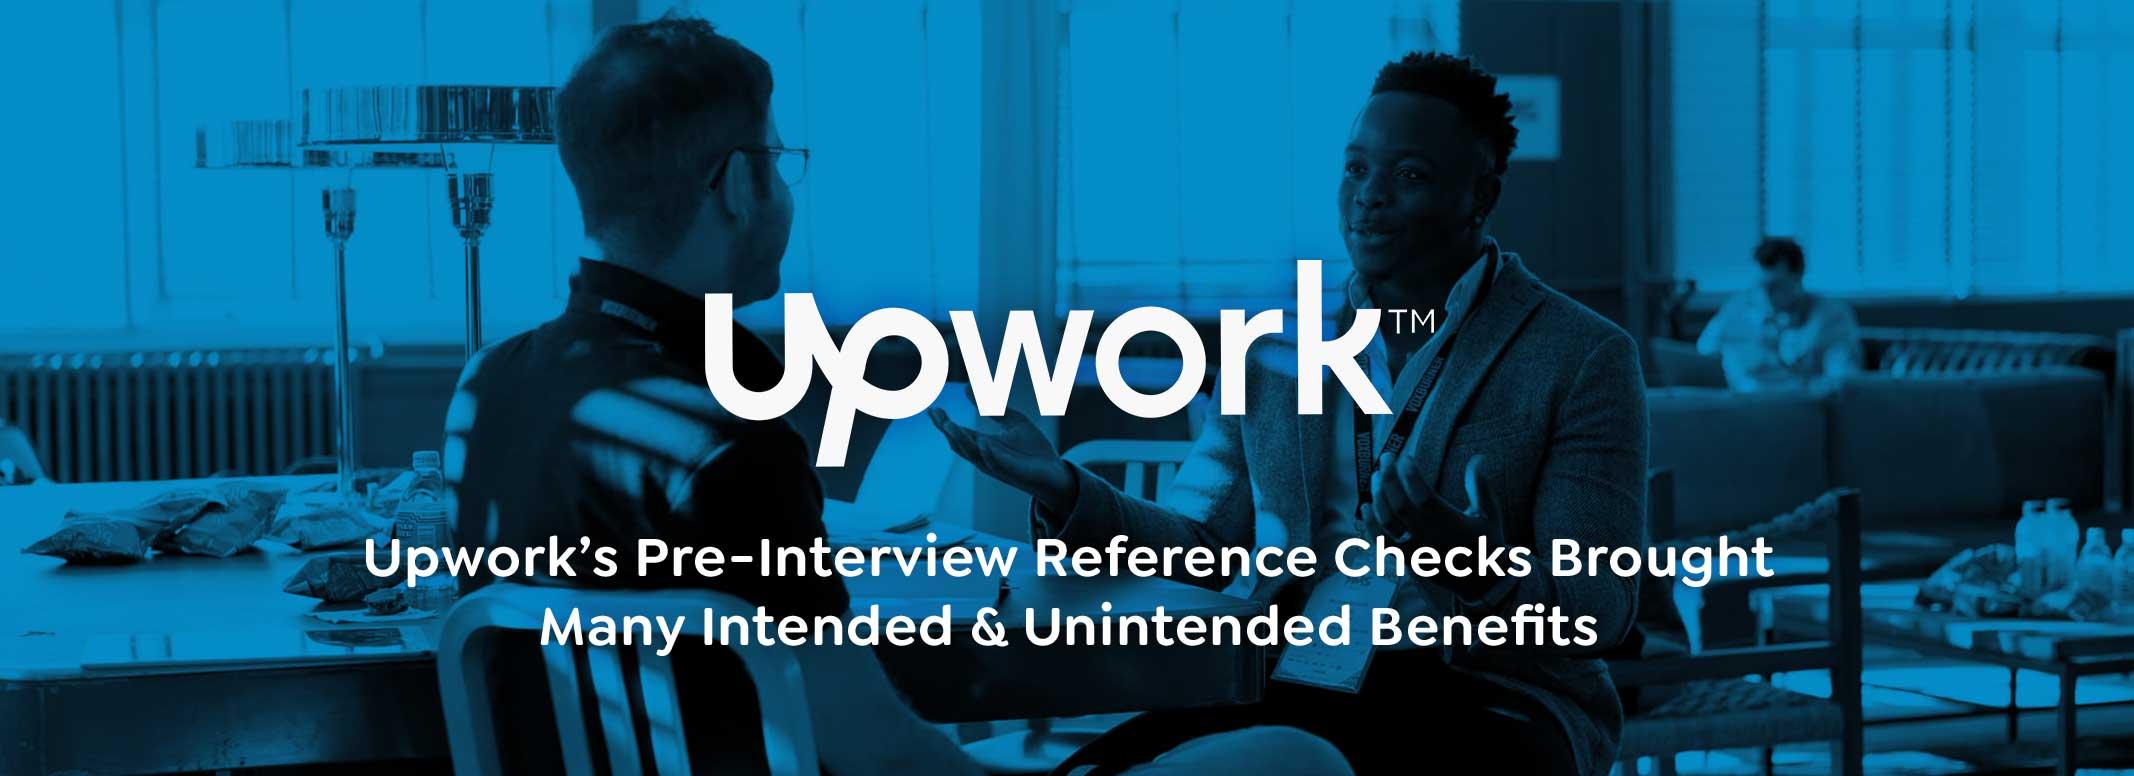 Customer Story - UpWork